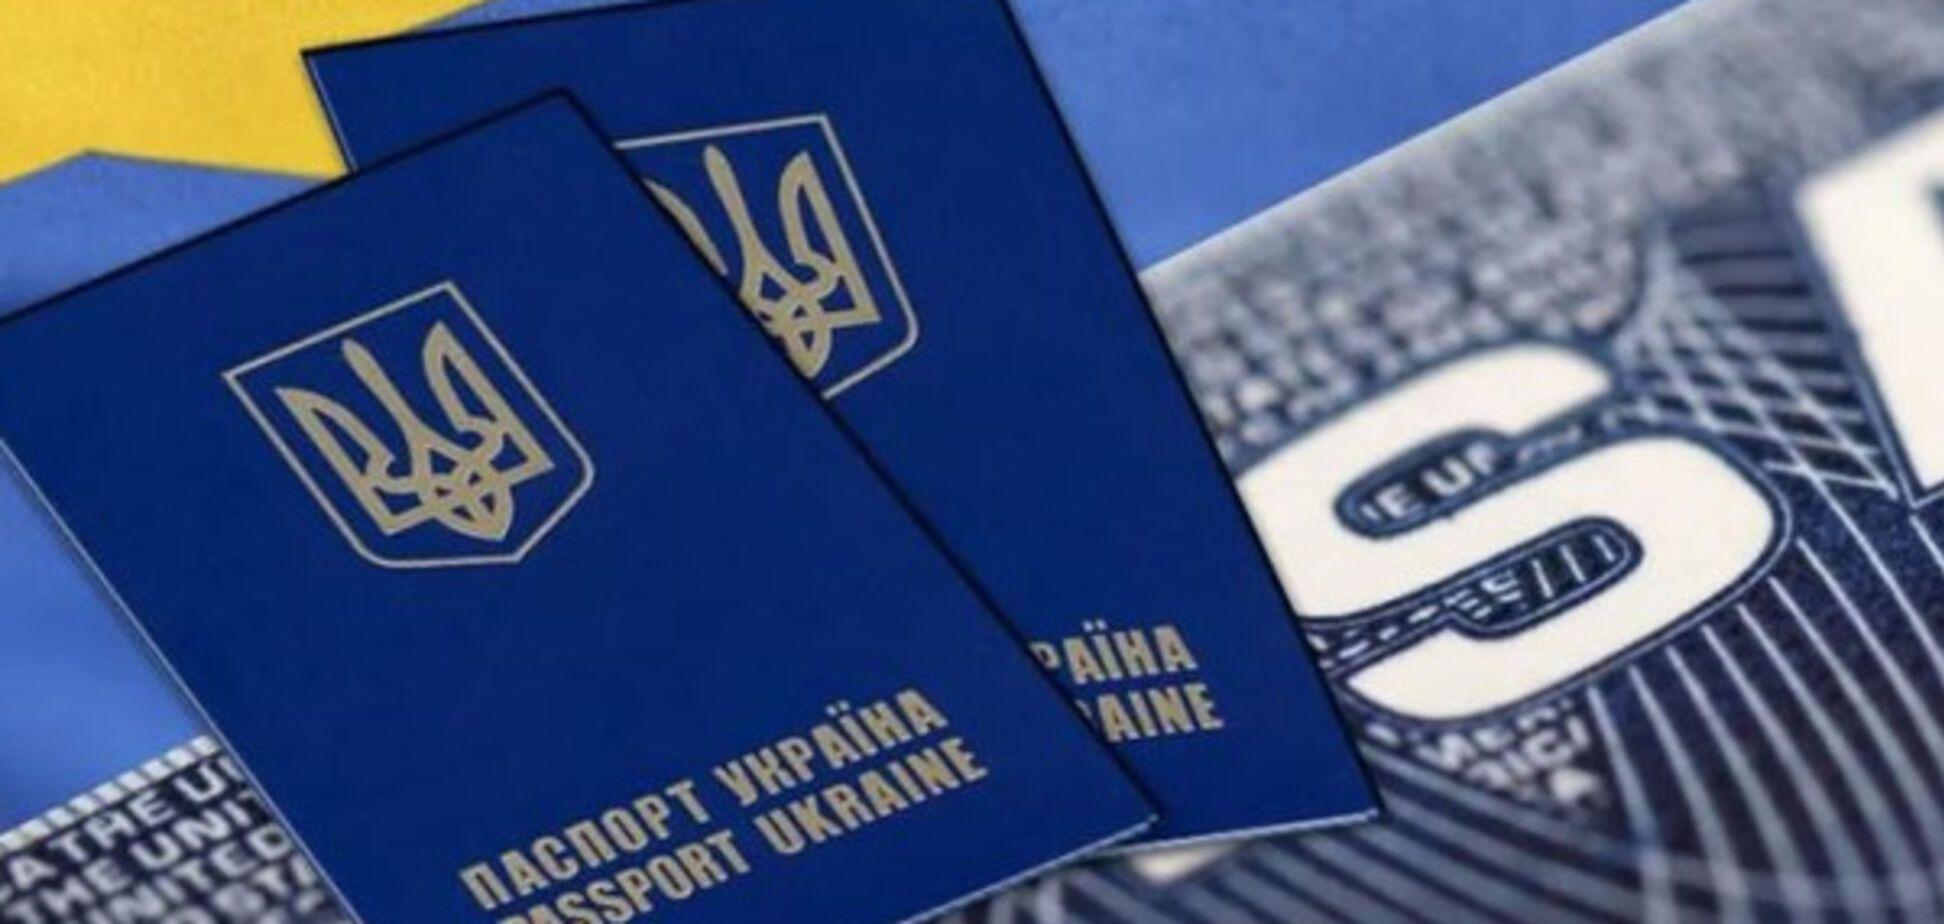 Работа за границей: в Украине хотят следить за рекрутерами